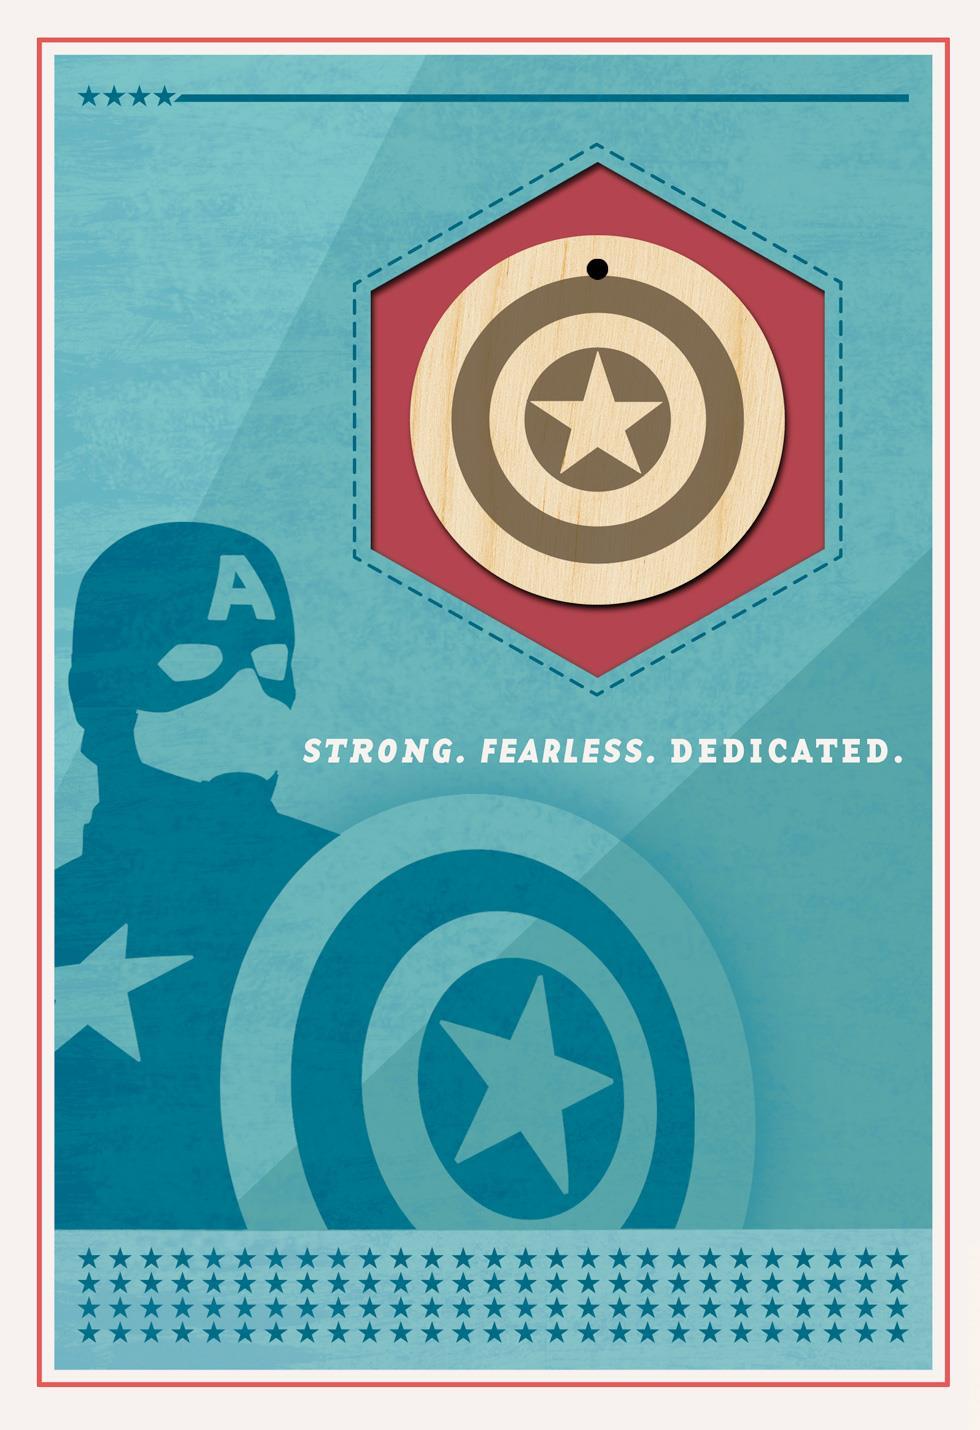 Marvel captain america greatness birthday card with keychain marvel captain america greatness birthday card with keychain bookmarktalkfo Images